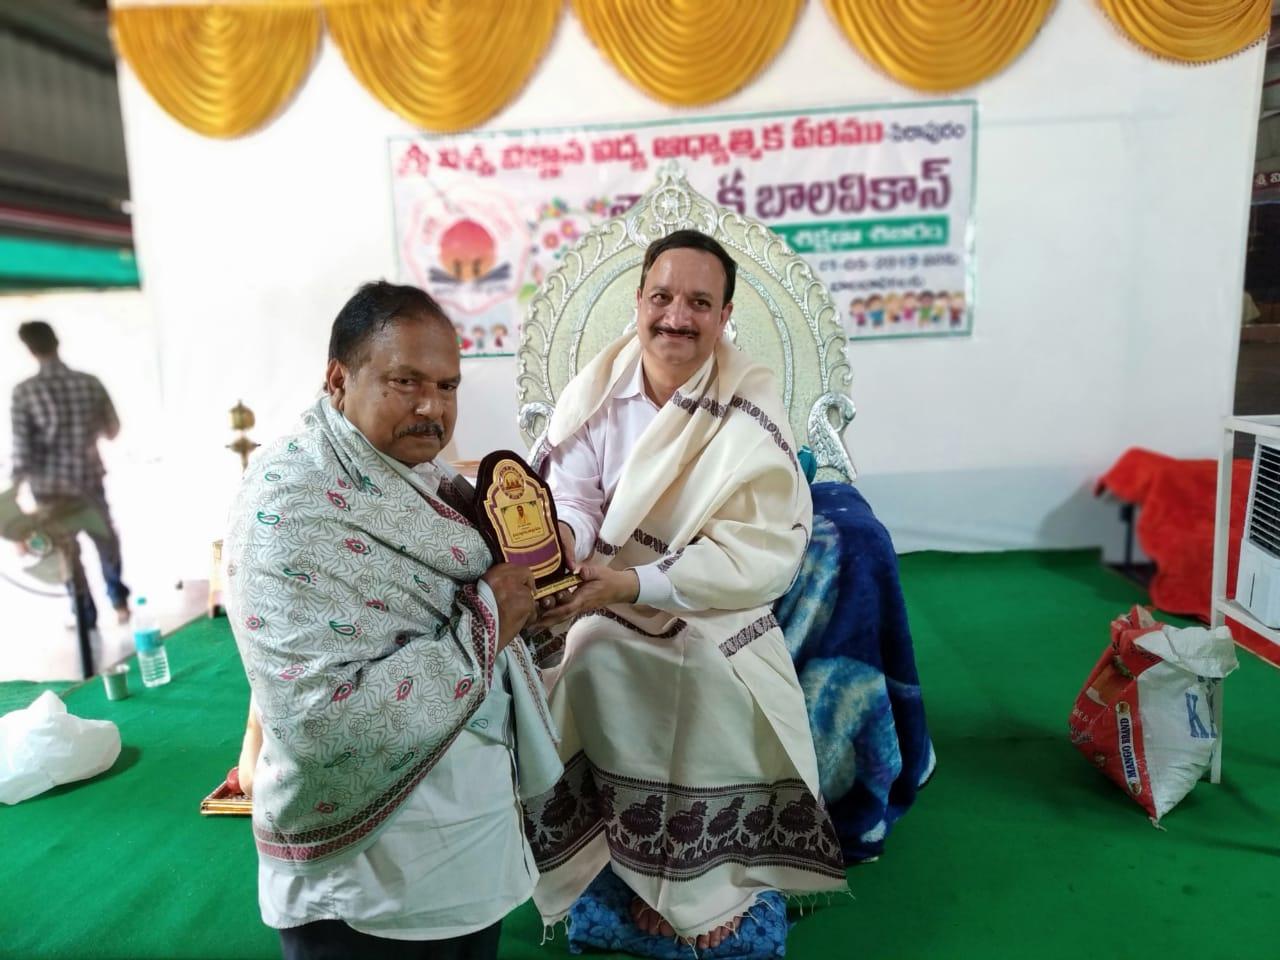 Felicitation to Psychologist Godavarthy Satyamurthi garu by Peethadipathi Dr. Umar Alisha Swamy garu